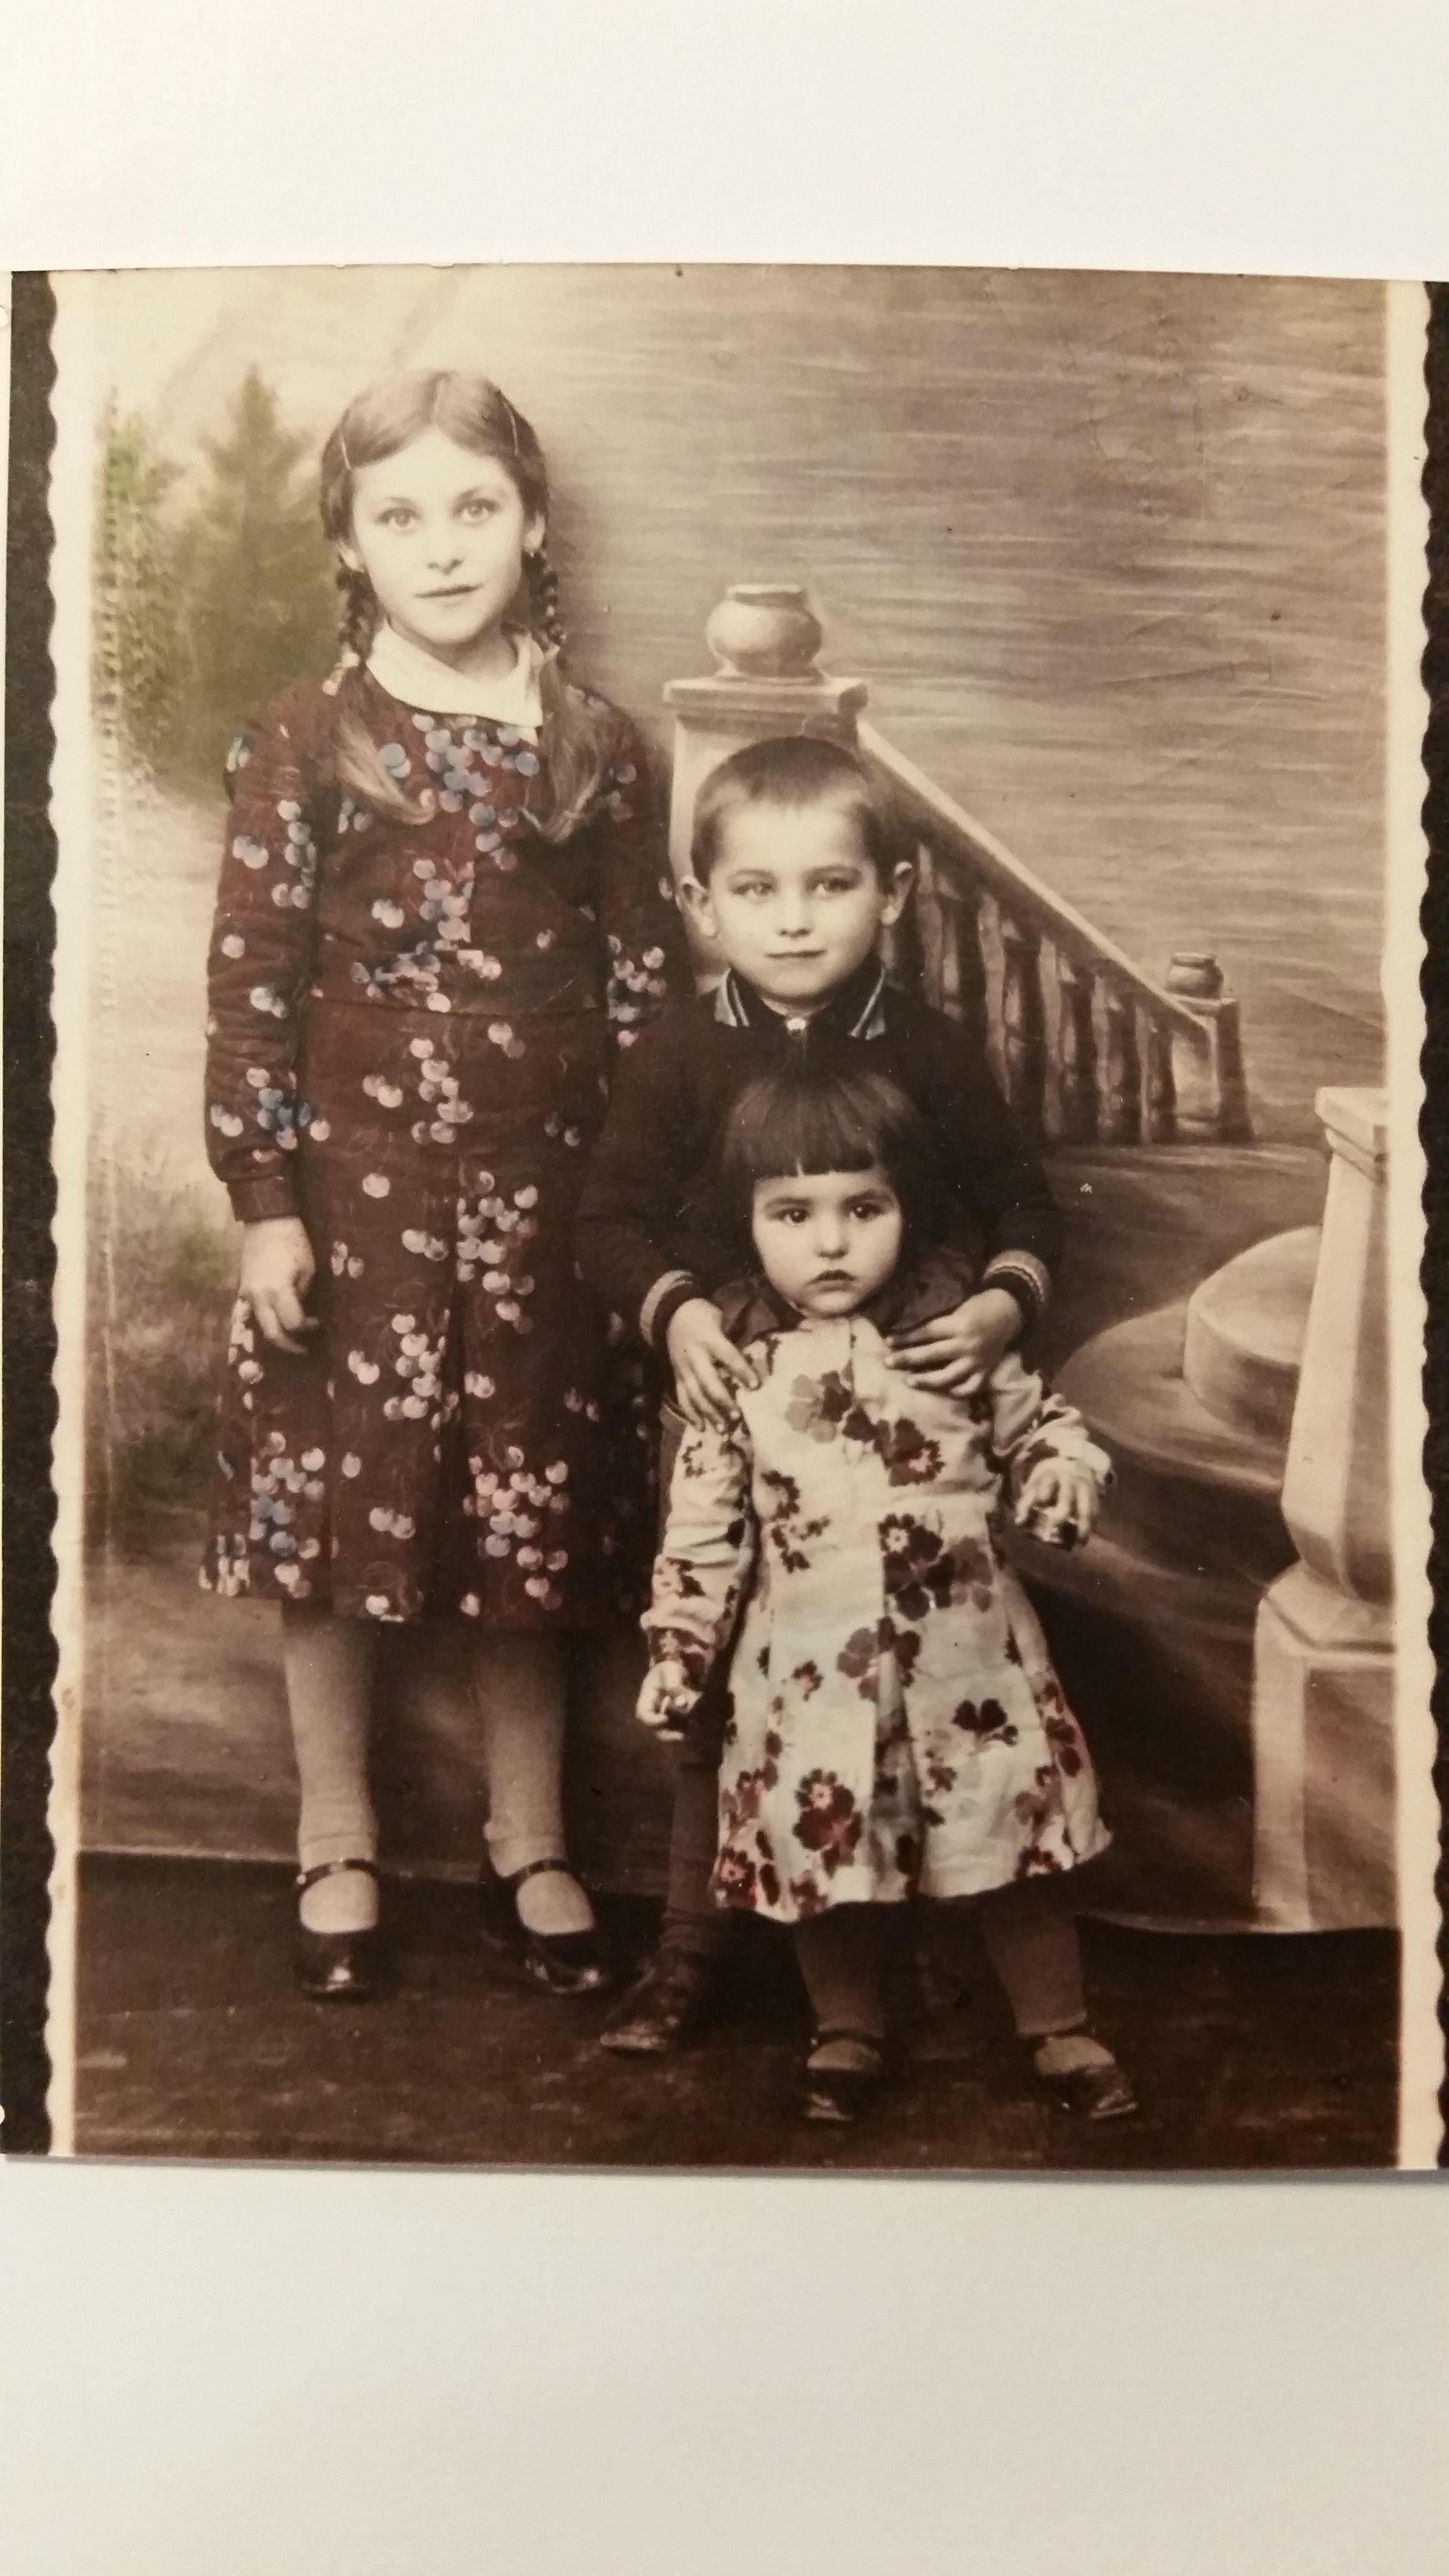 Eva Edl and her siblings20170517_185603